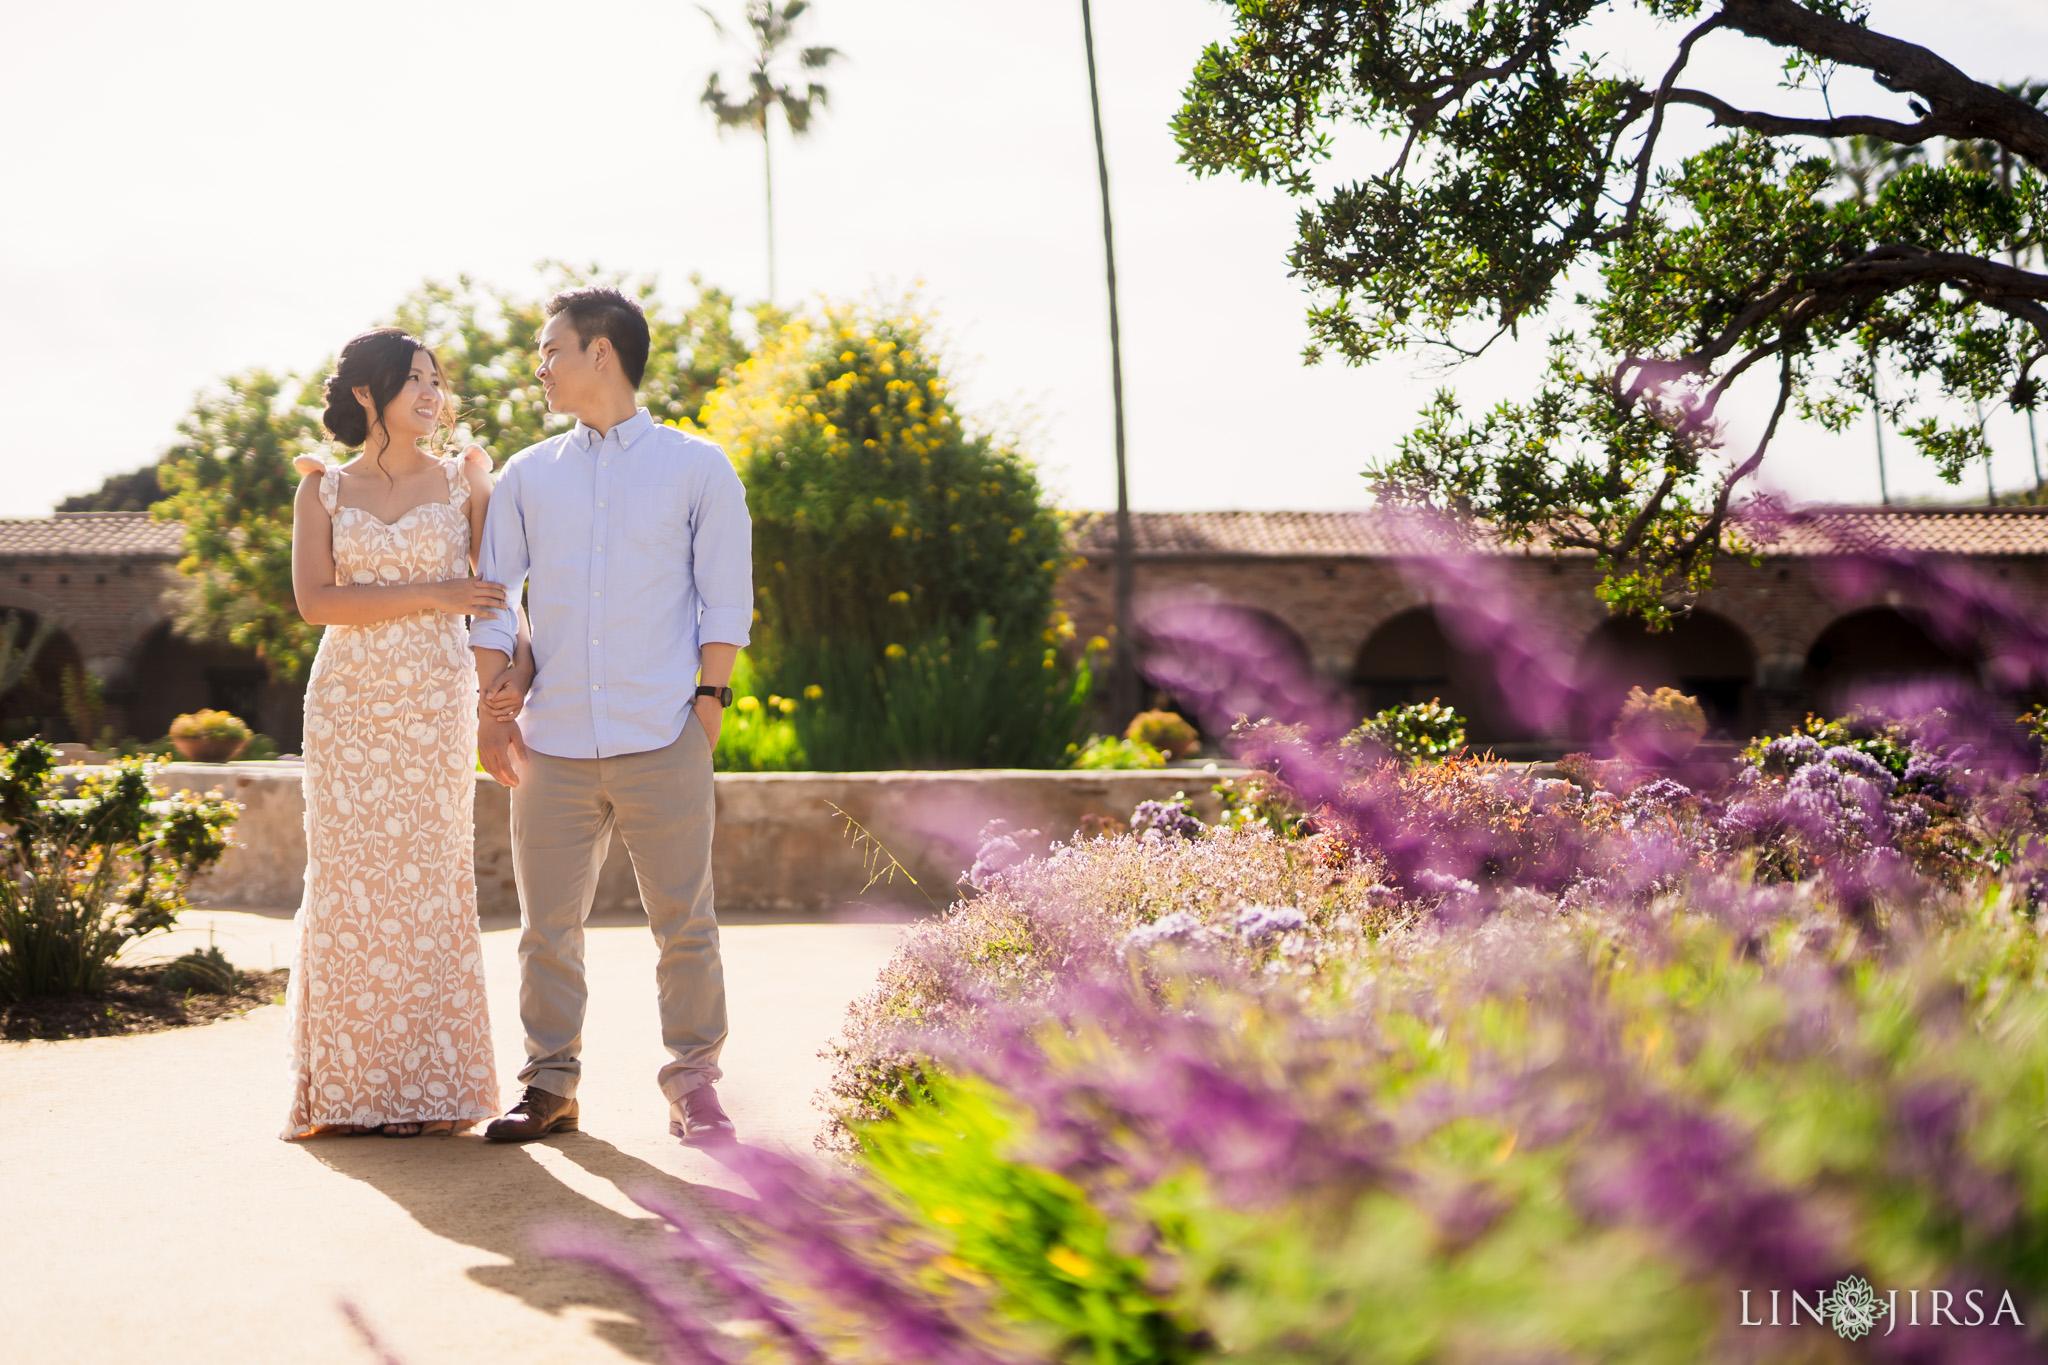 04 Mission San Juan Capistrano Engagement Photography 1